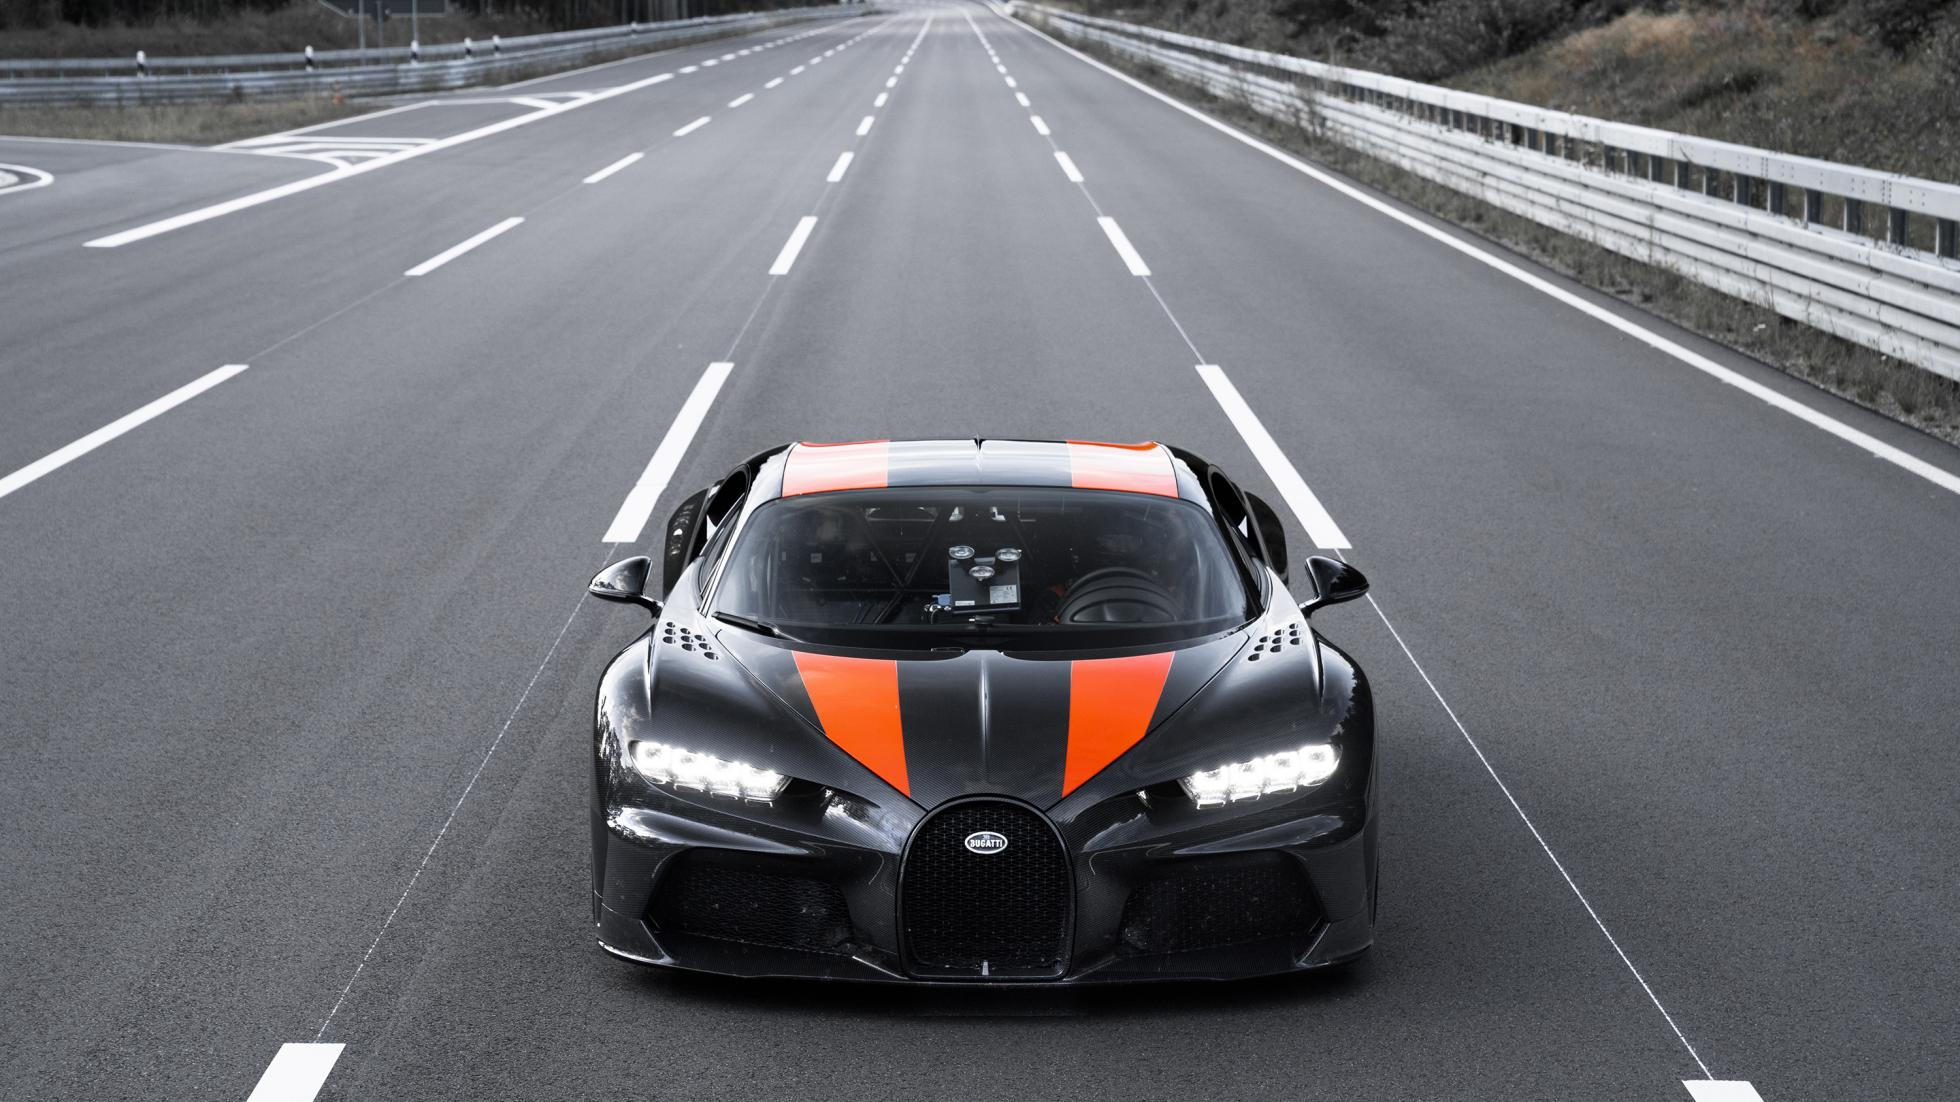 Гиперкар Bugatti Chiron разогнали почти до 500 км/ч